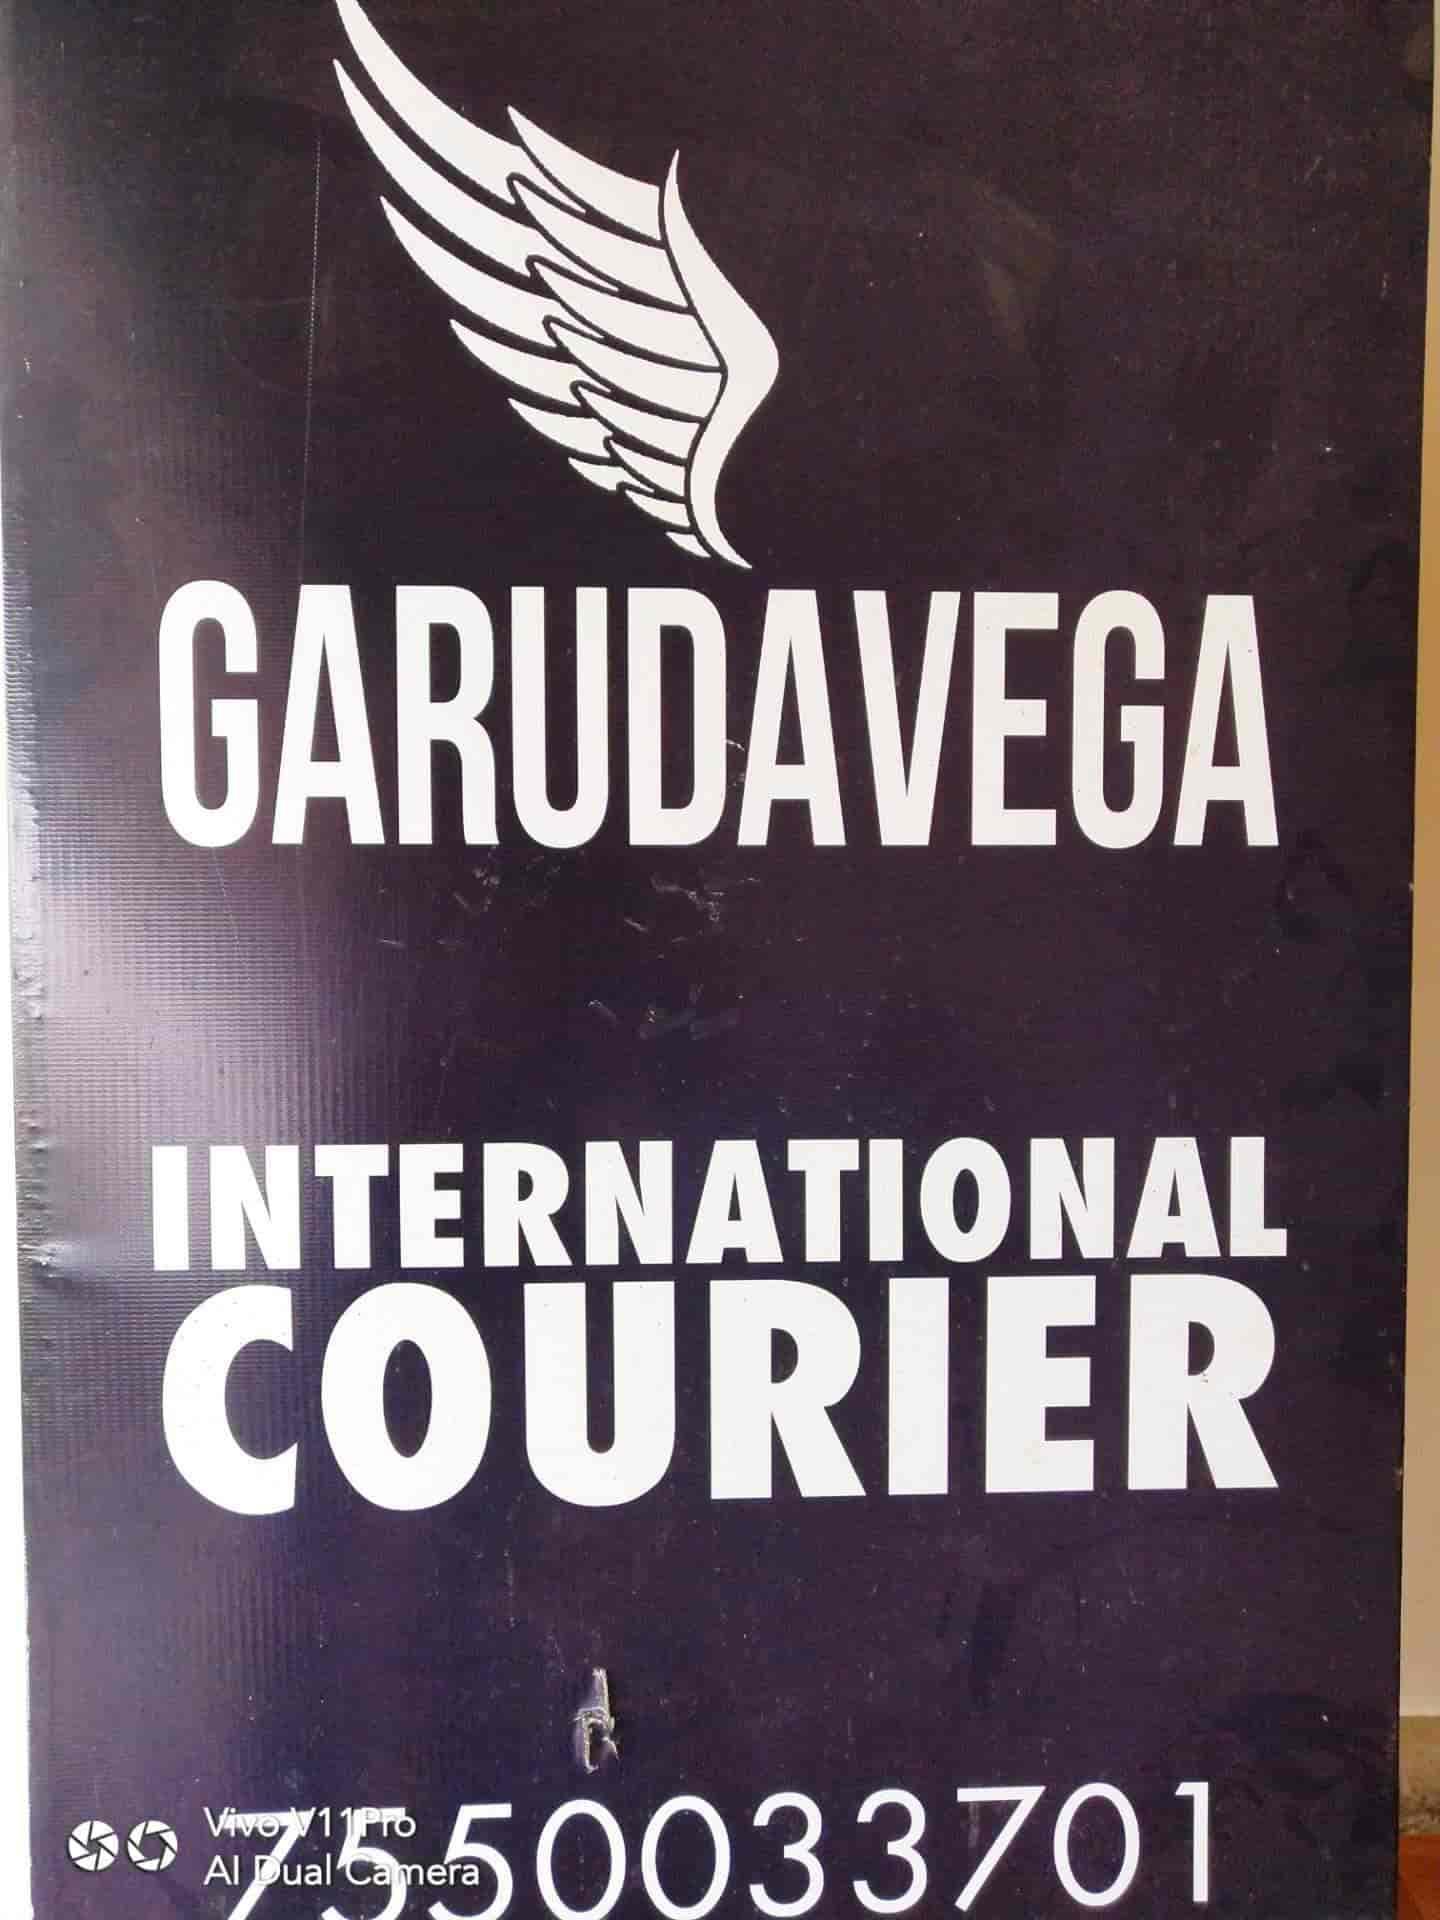 Garudavega International Courier, Vadasery - Courier